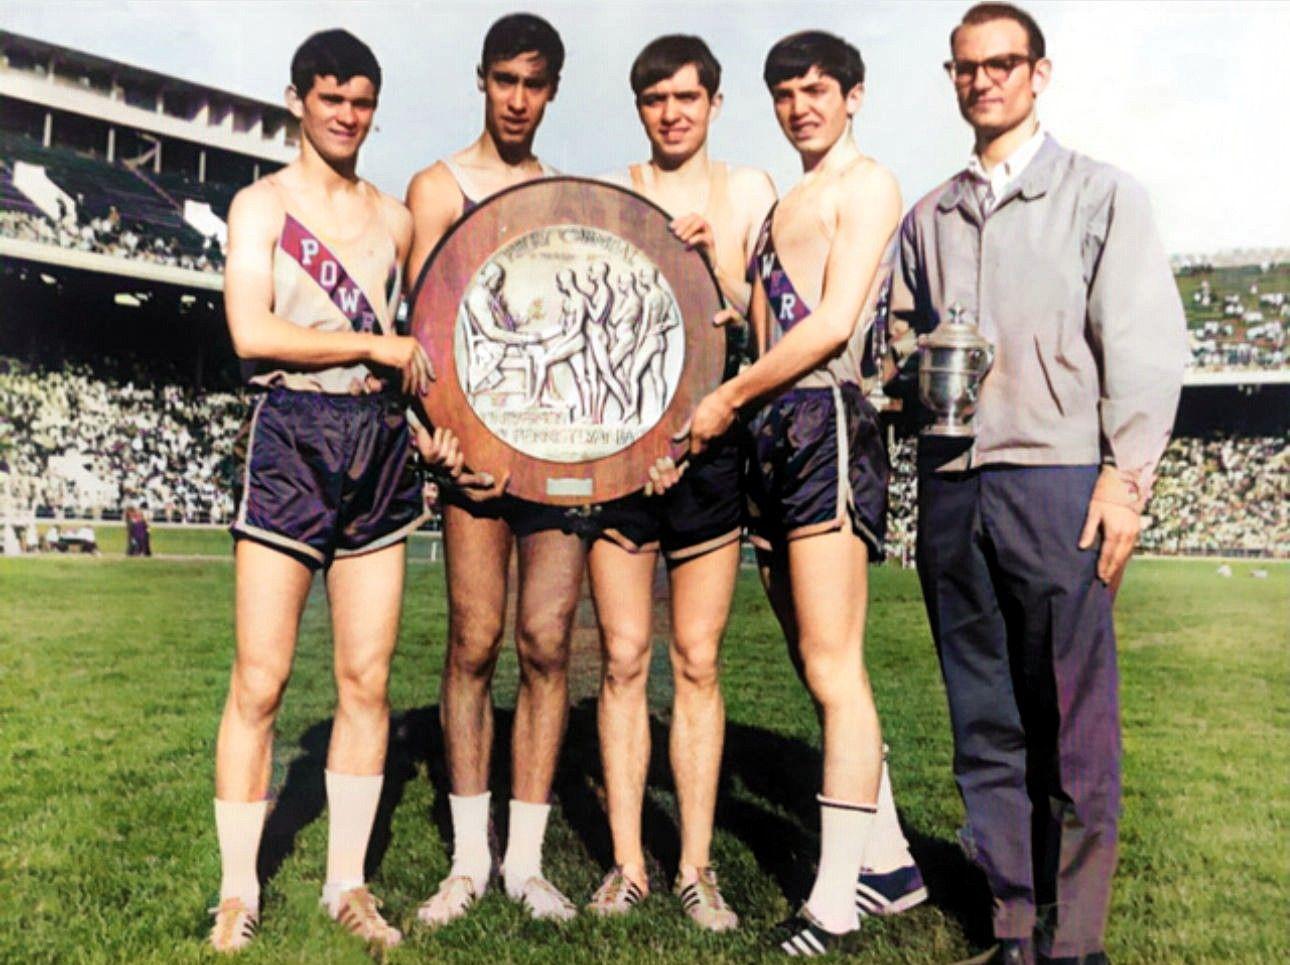 1969 Penn Relays 2 Mile Relay team photo